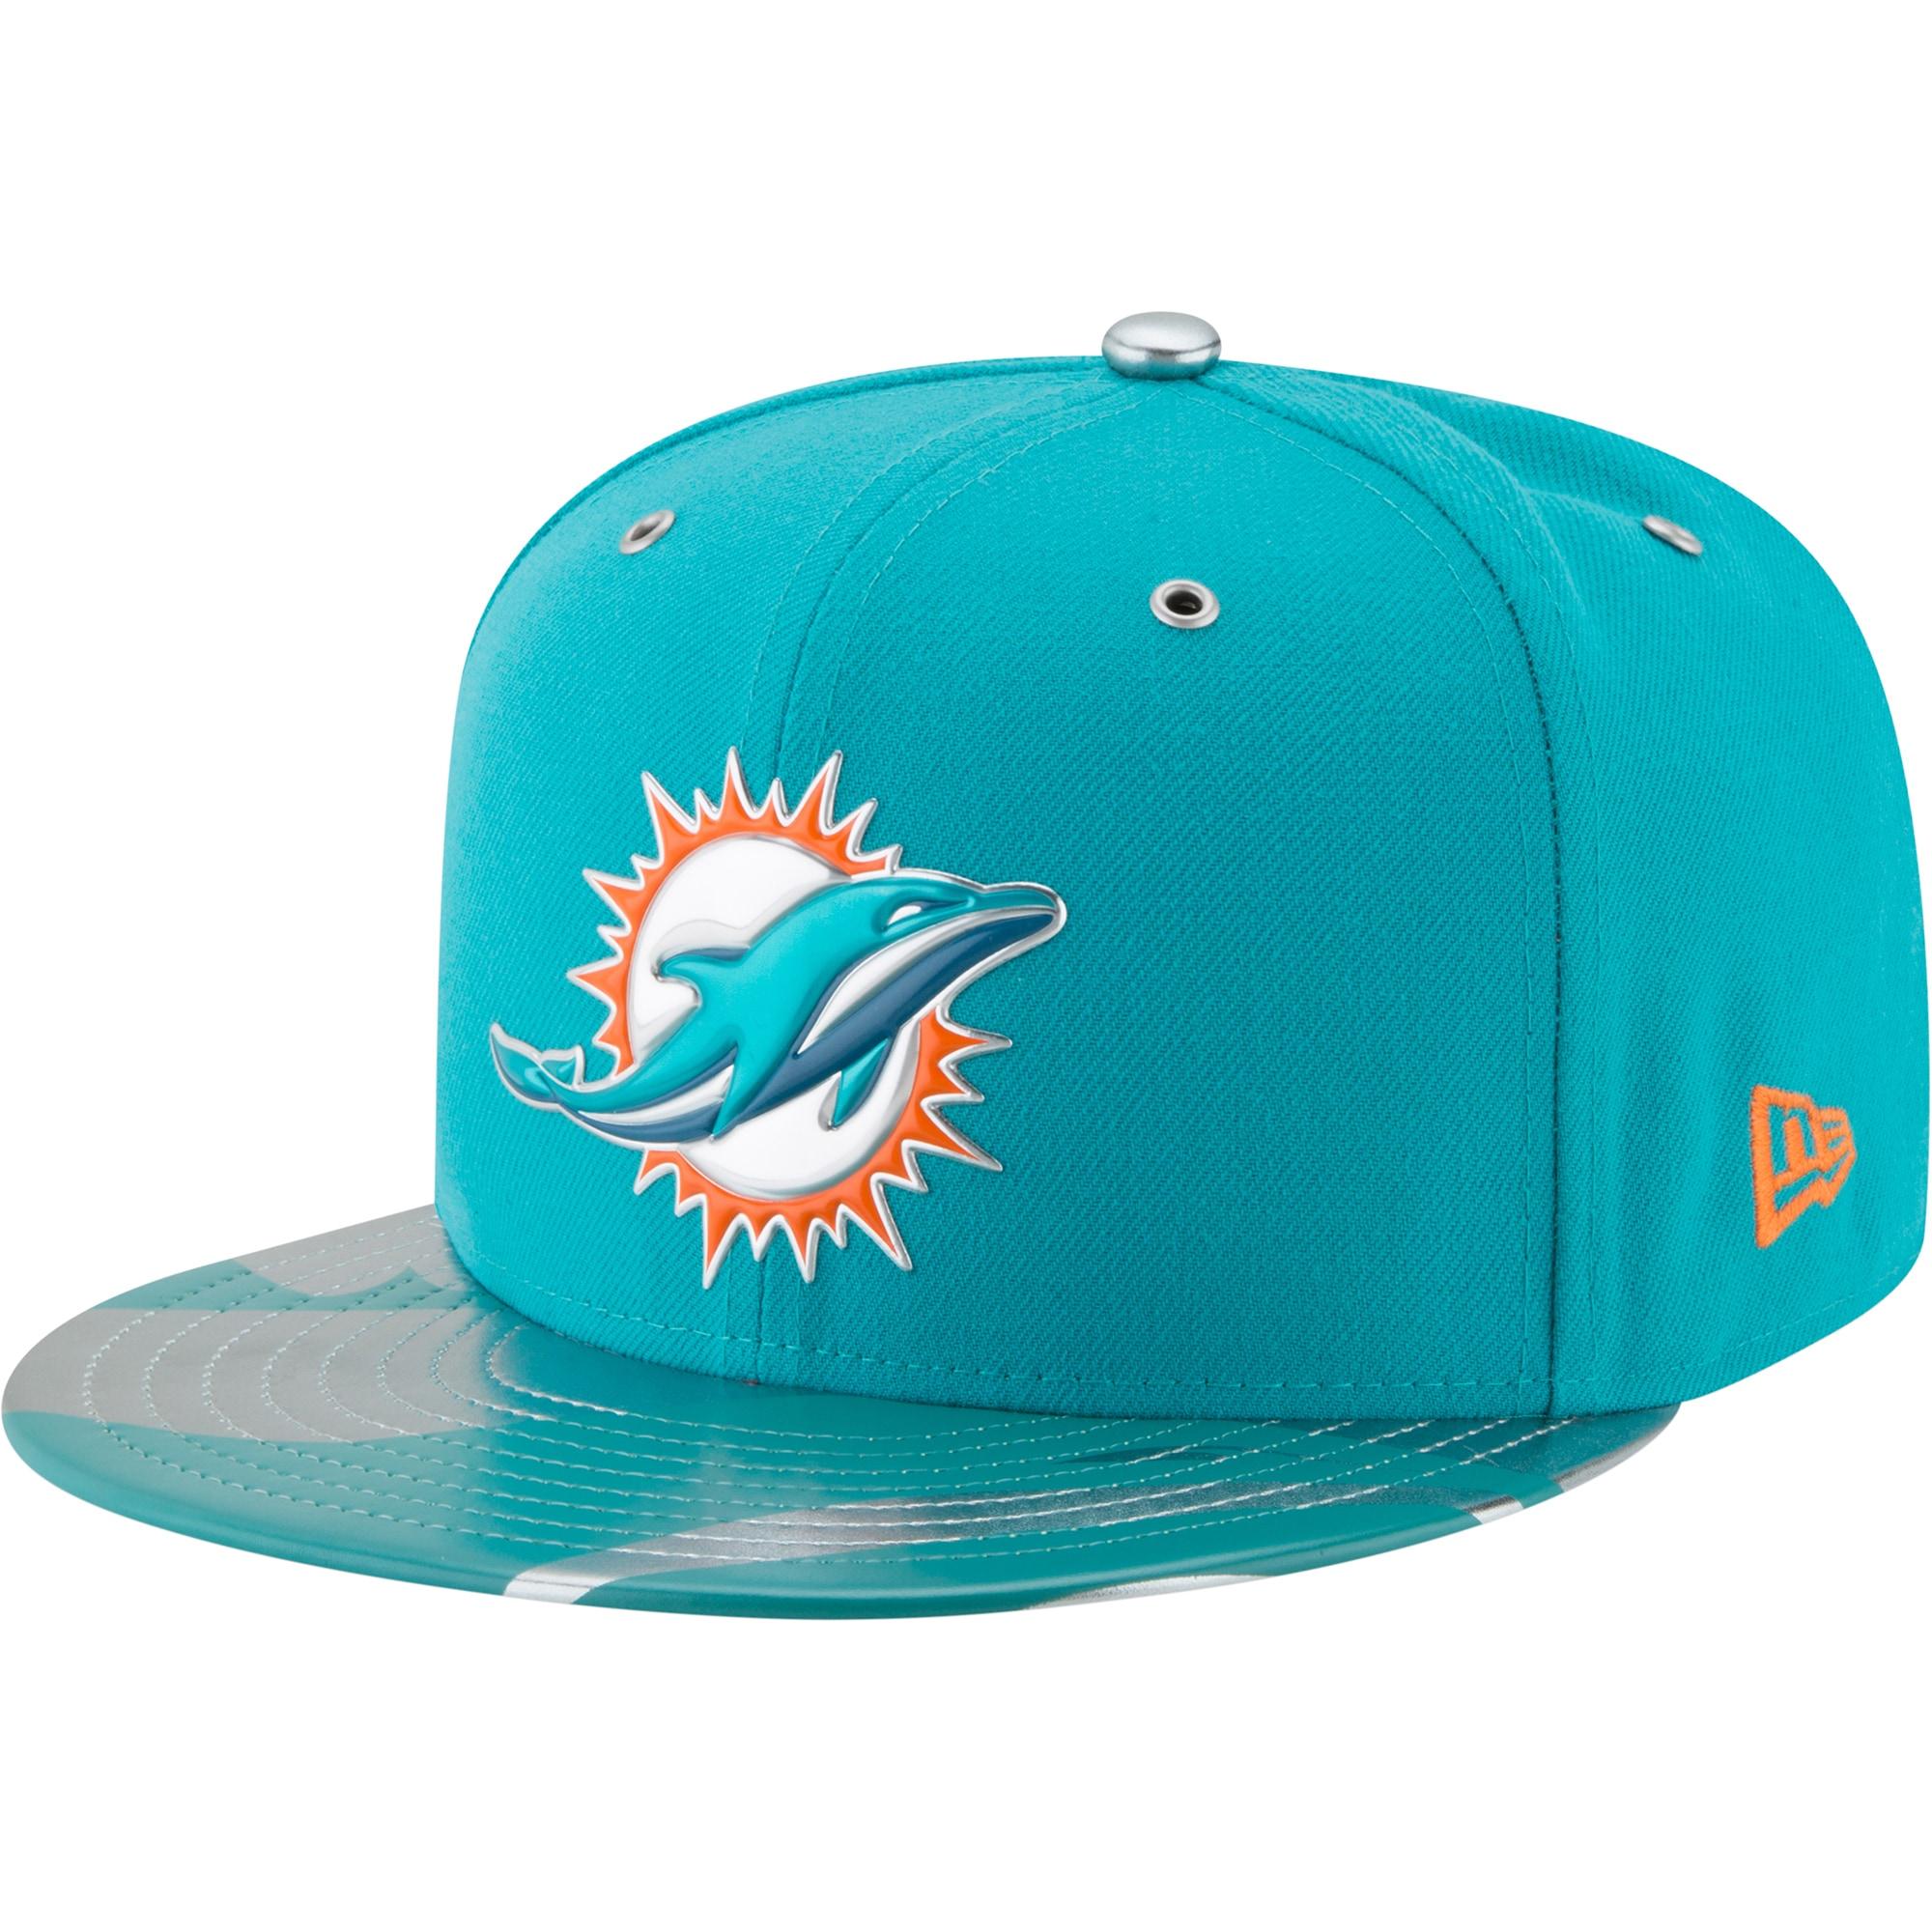 Miami Dolphins New Era NFL Spotlight 59FIFTY Fitted Hat - Aqua